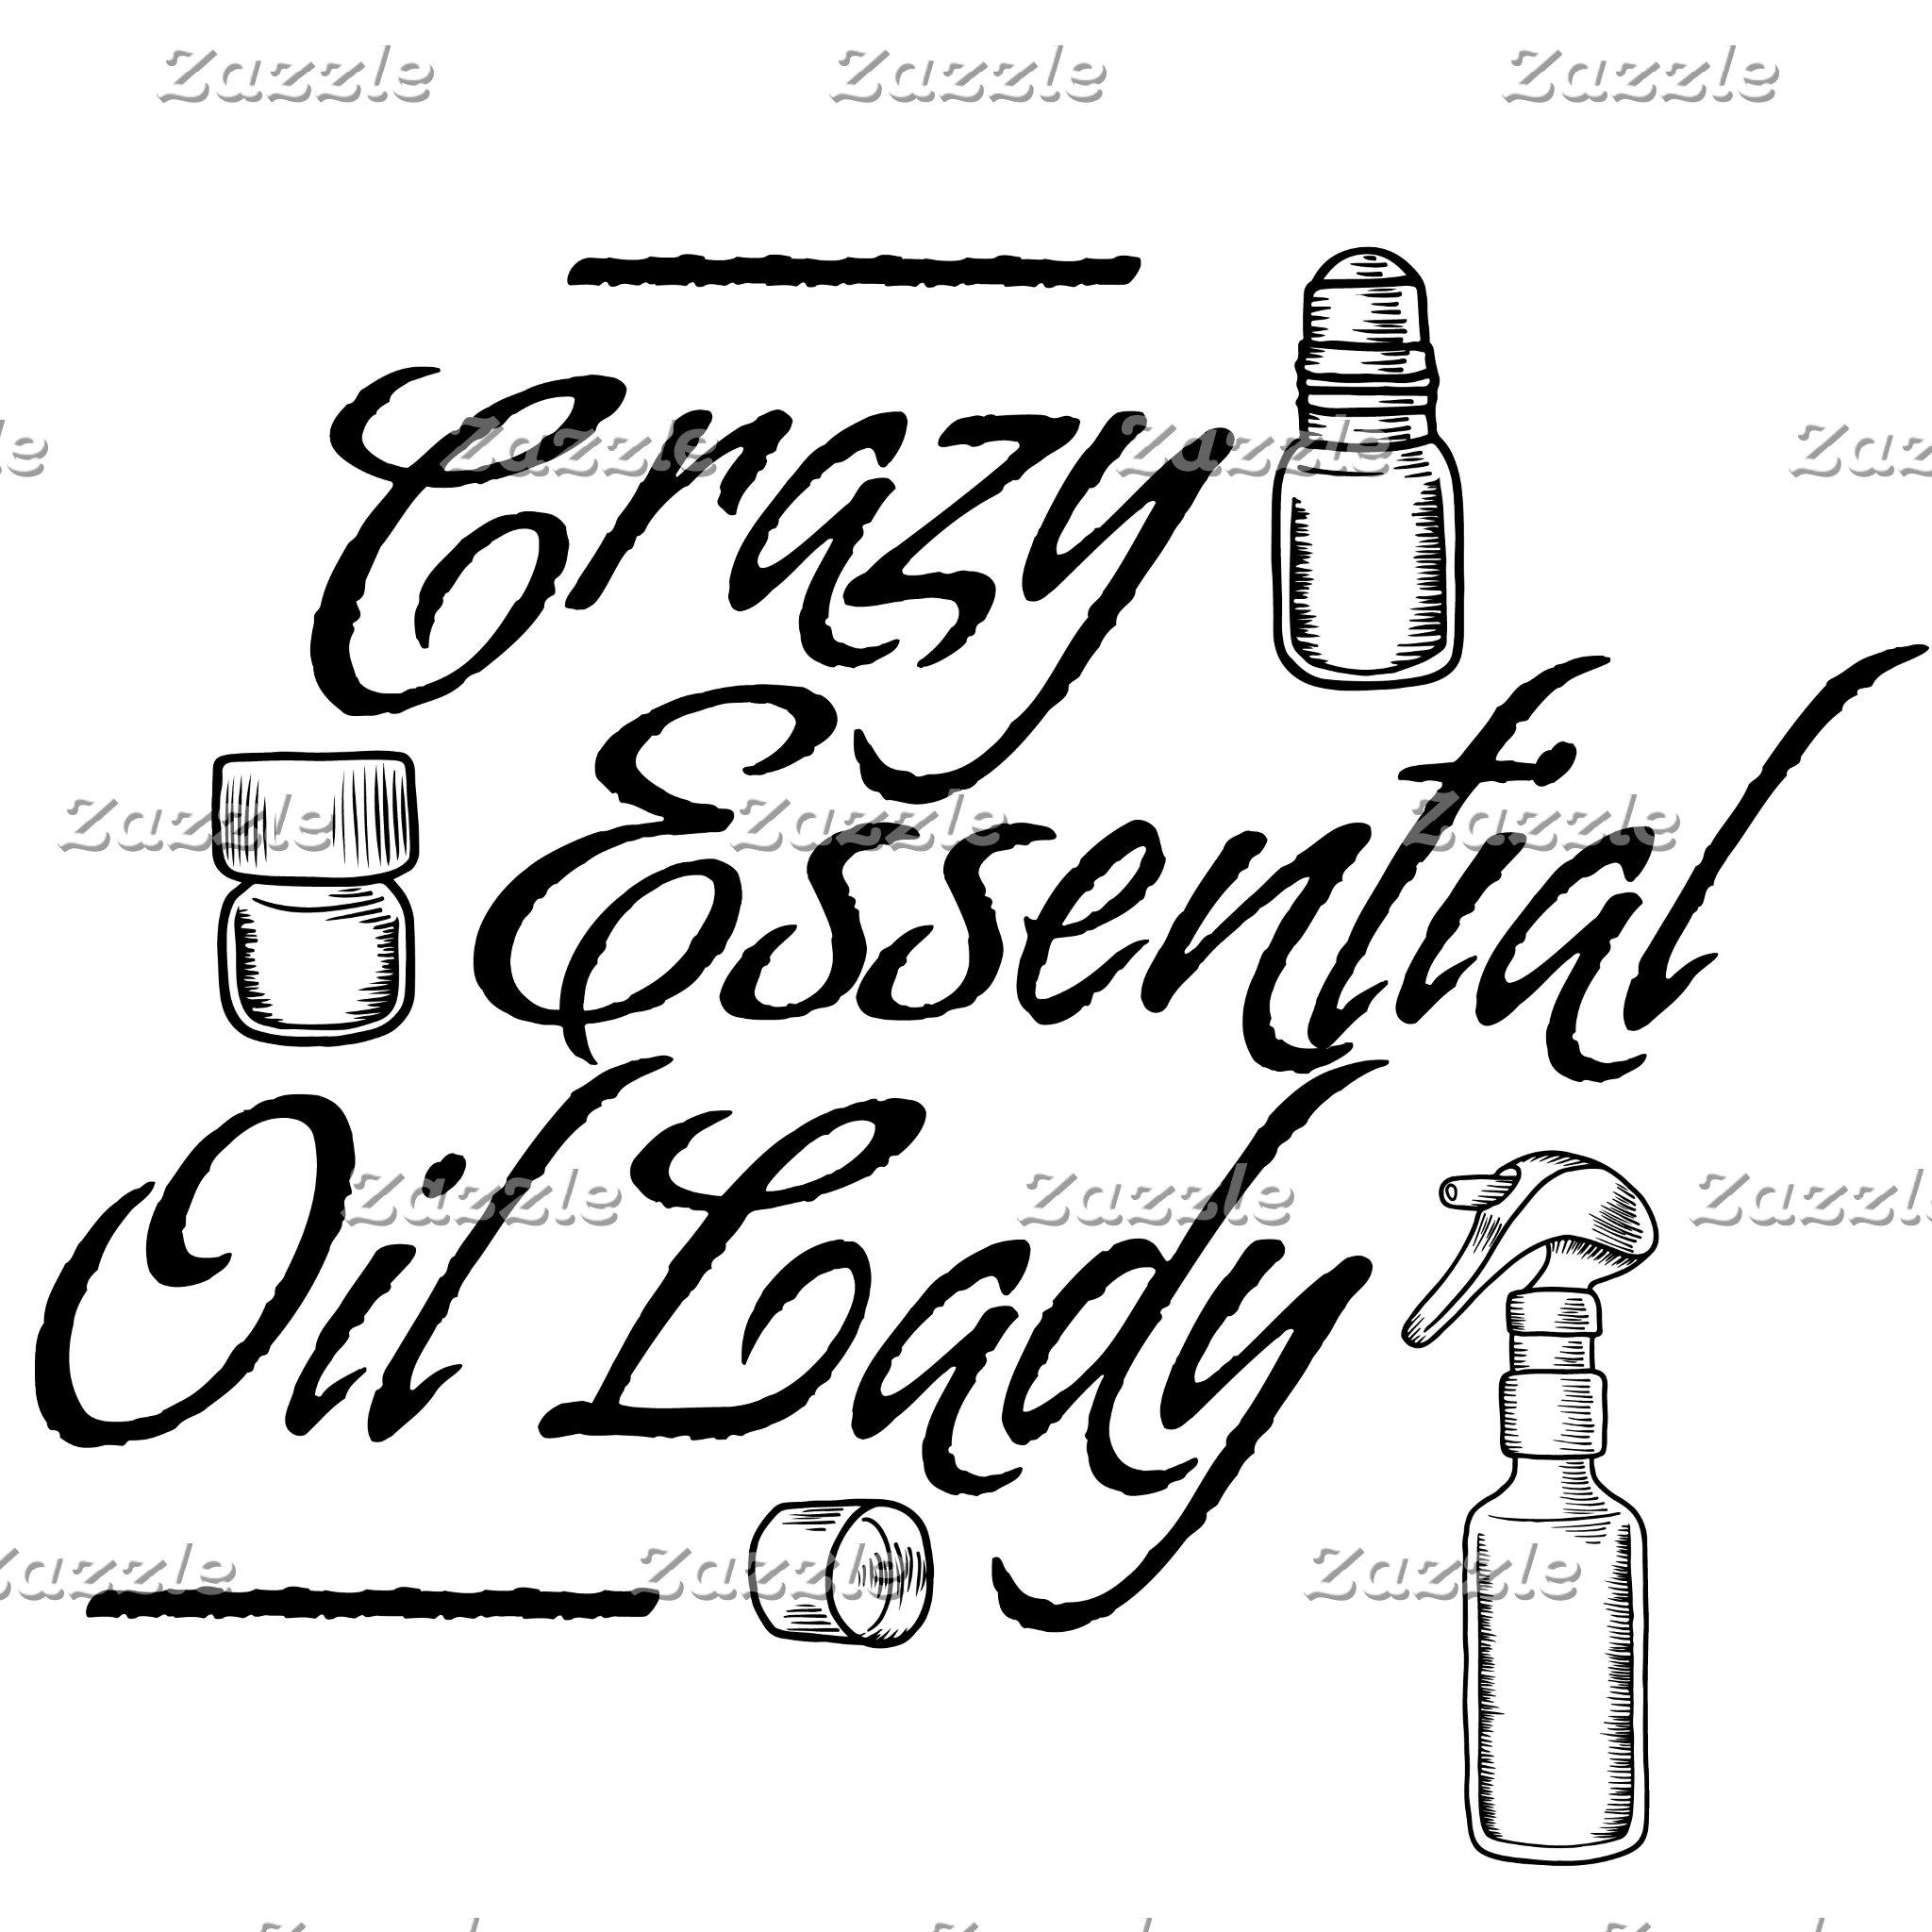 Crazy Essential Oil Lady